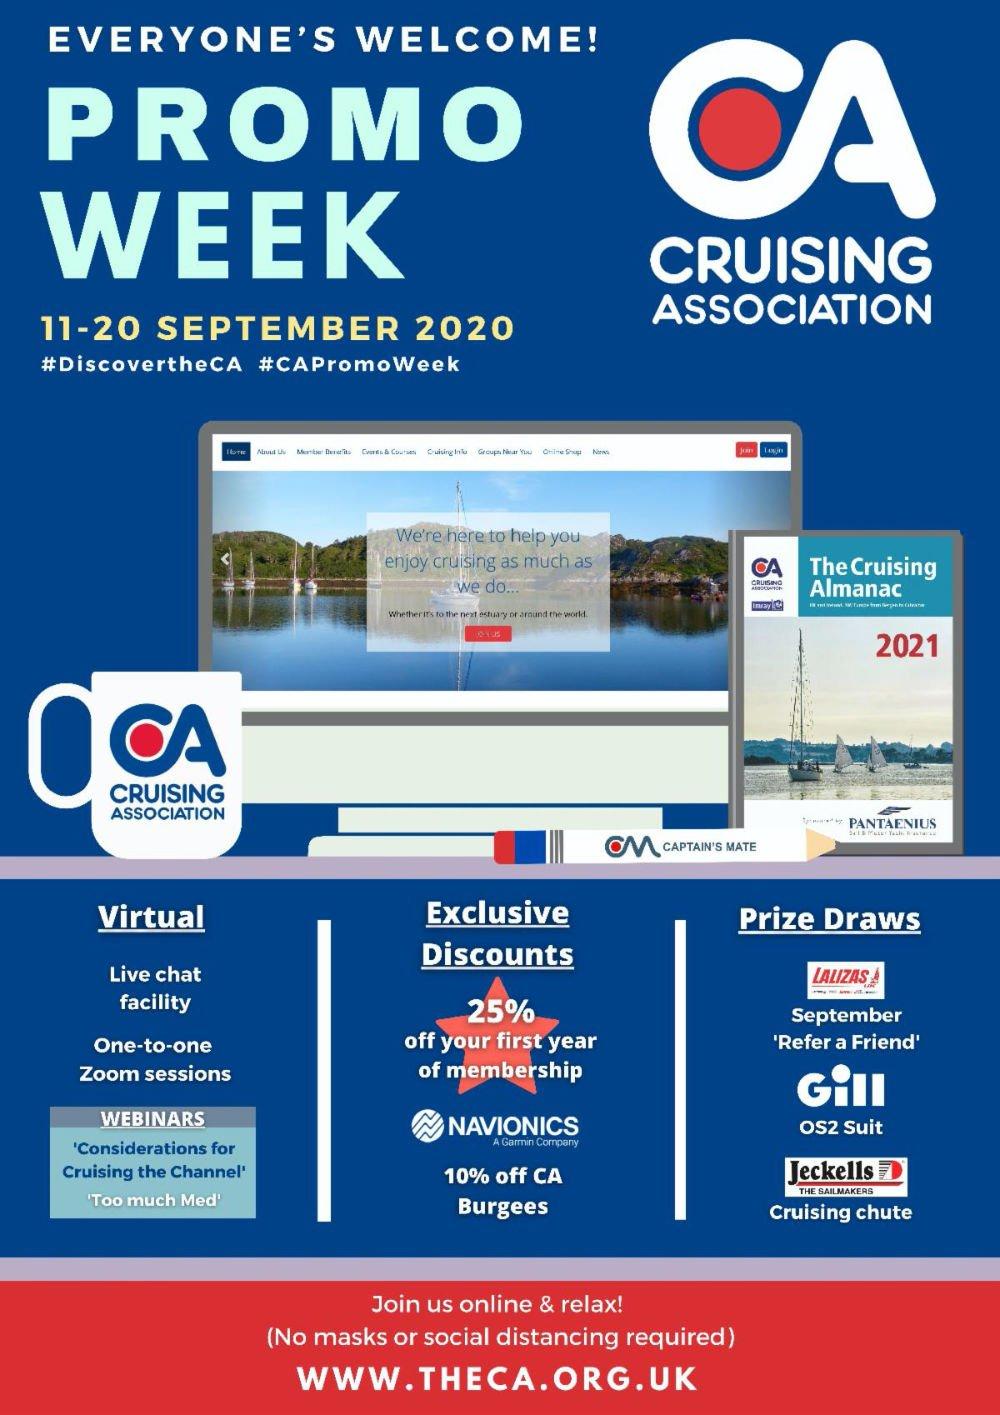 Cruising Association launches online Promo Week